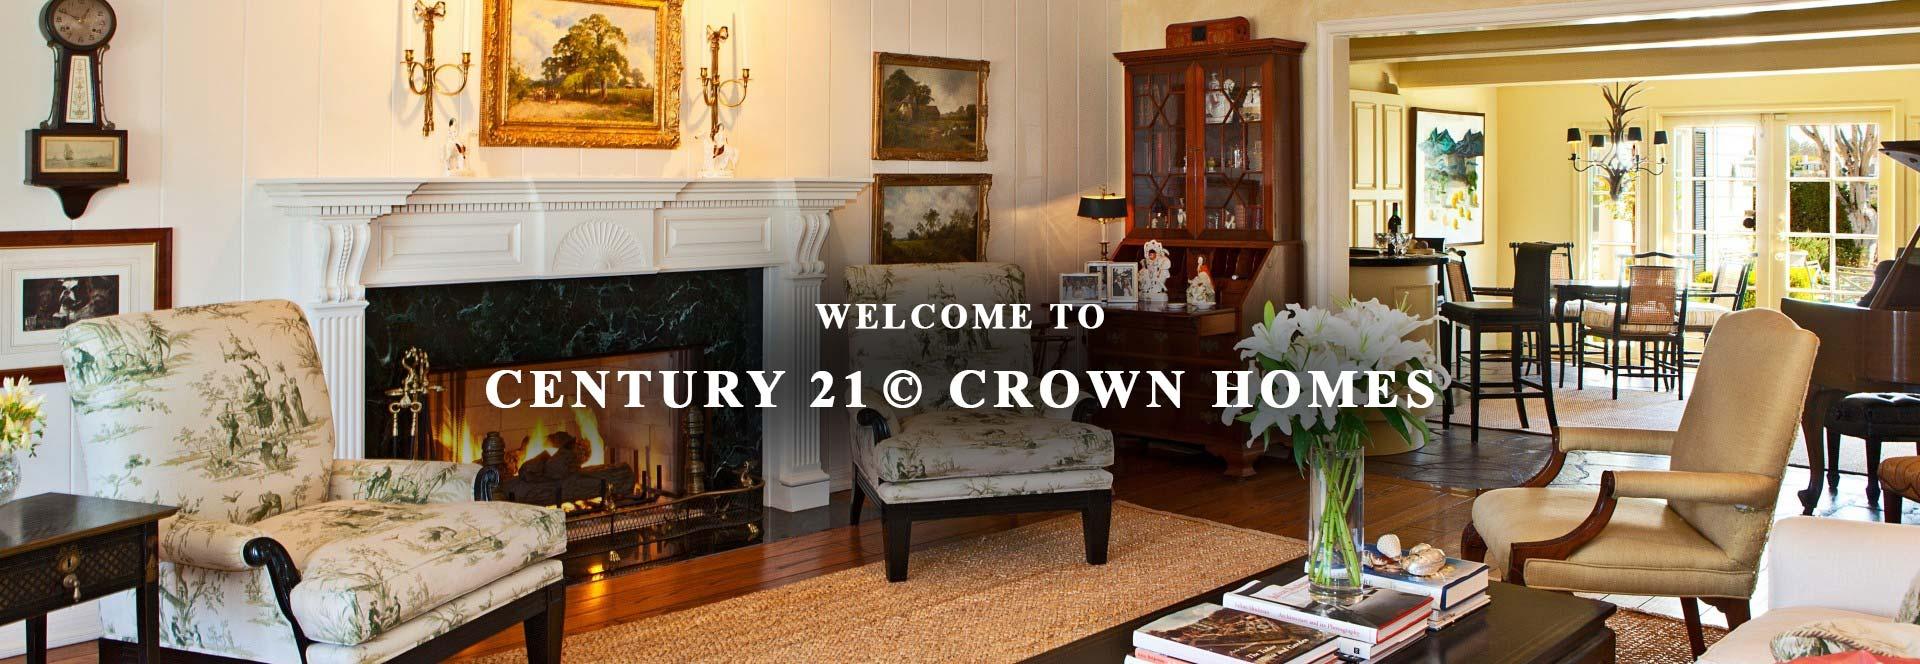 Century 21 Crown Homes U2013 West Islip Century 21 Real Estate